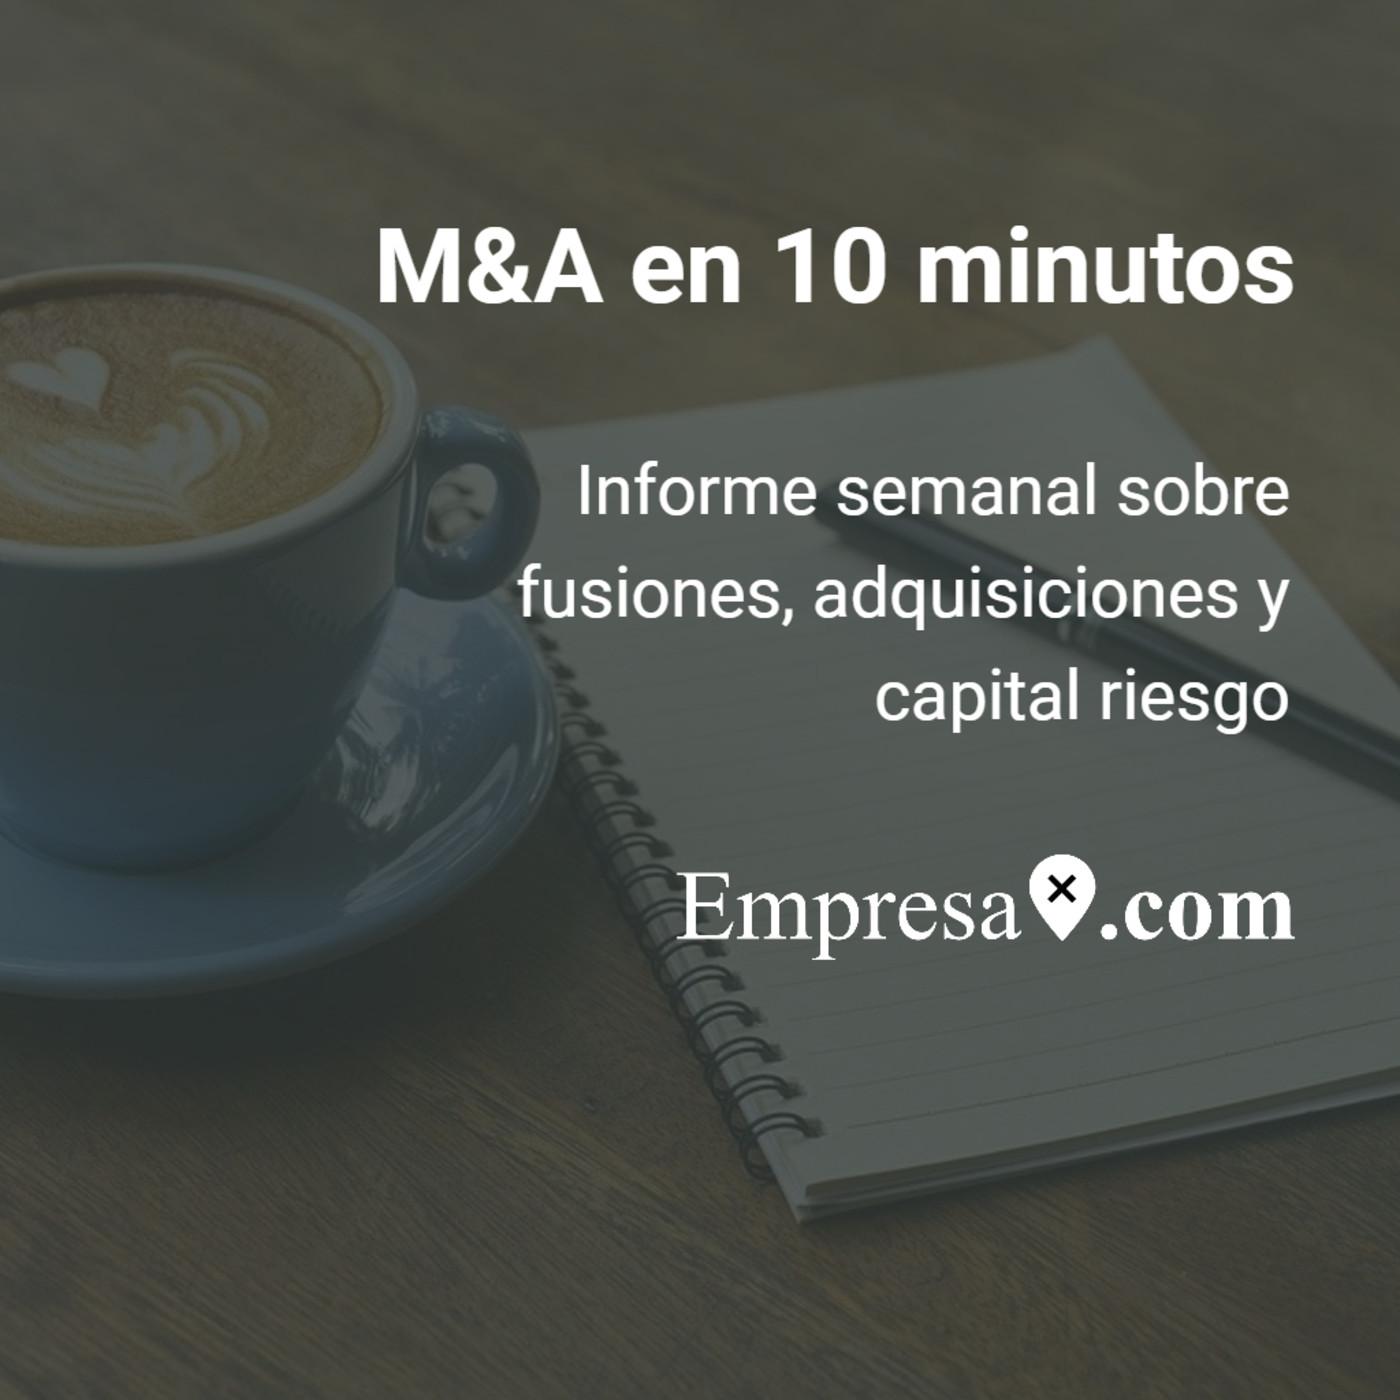 M&A en 10 minutos: MAT Holding, Fluidra, Babel y Talde